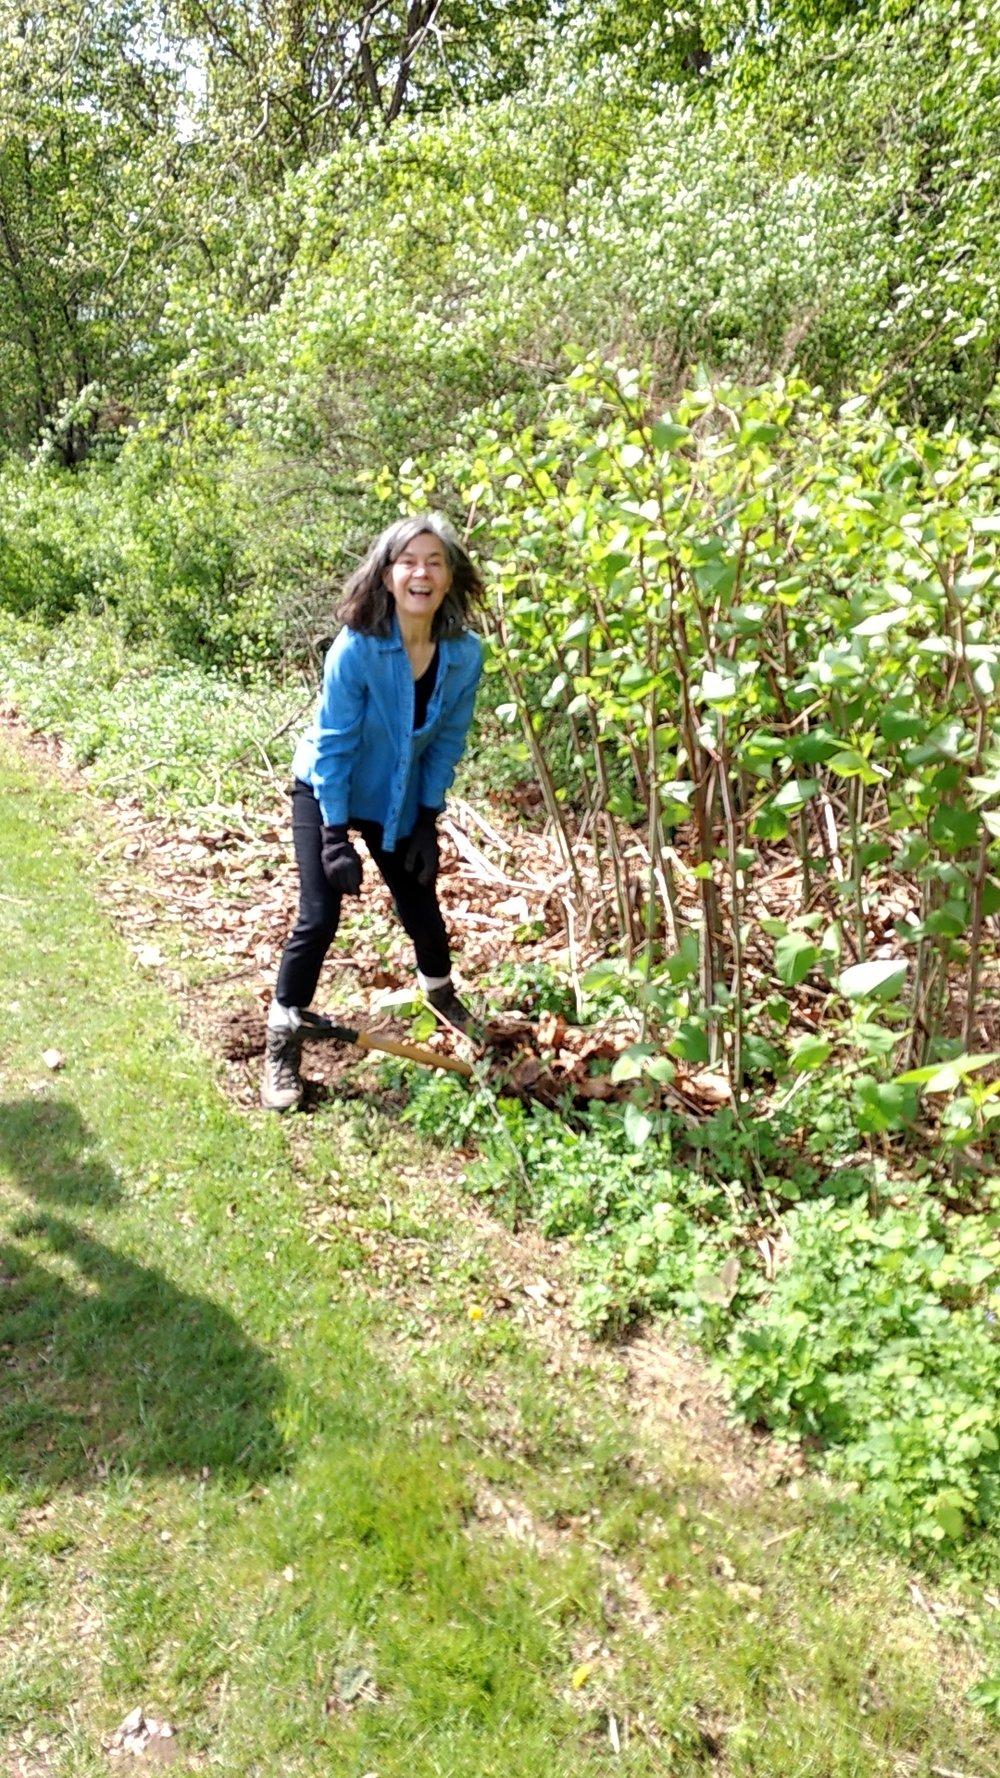 Susan Mayr digging out knotweed - image by Dan Snider